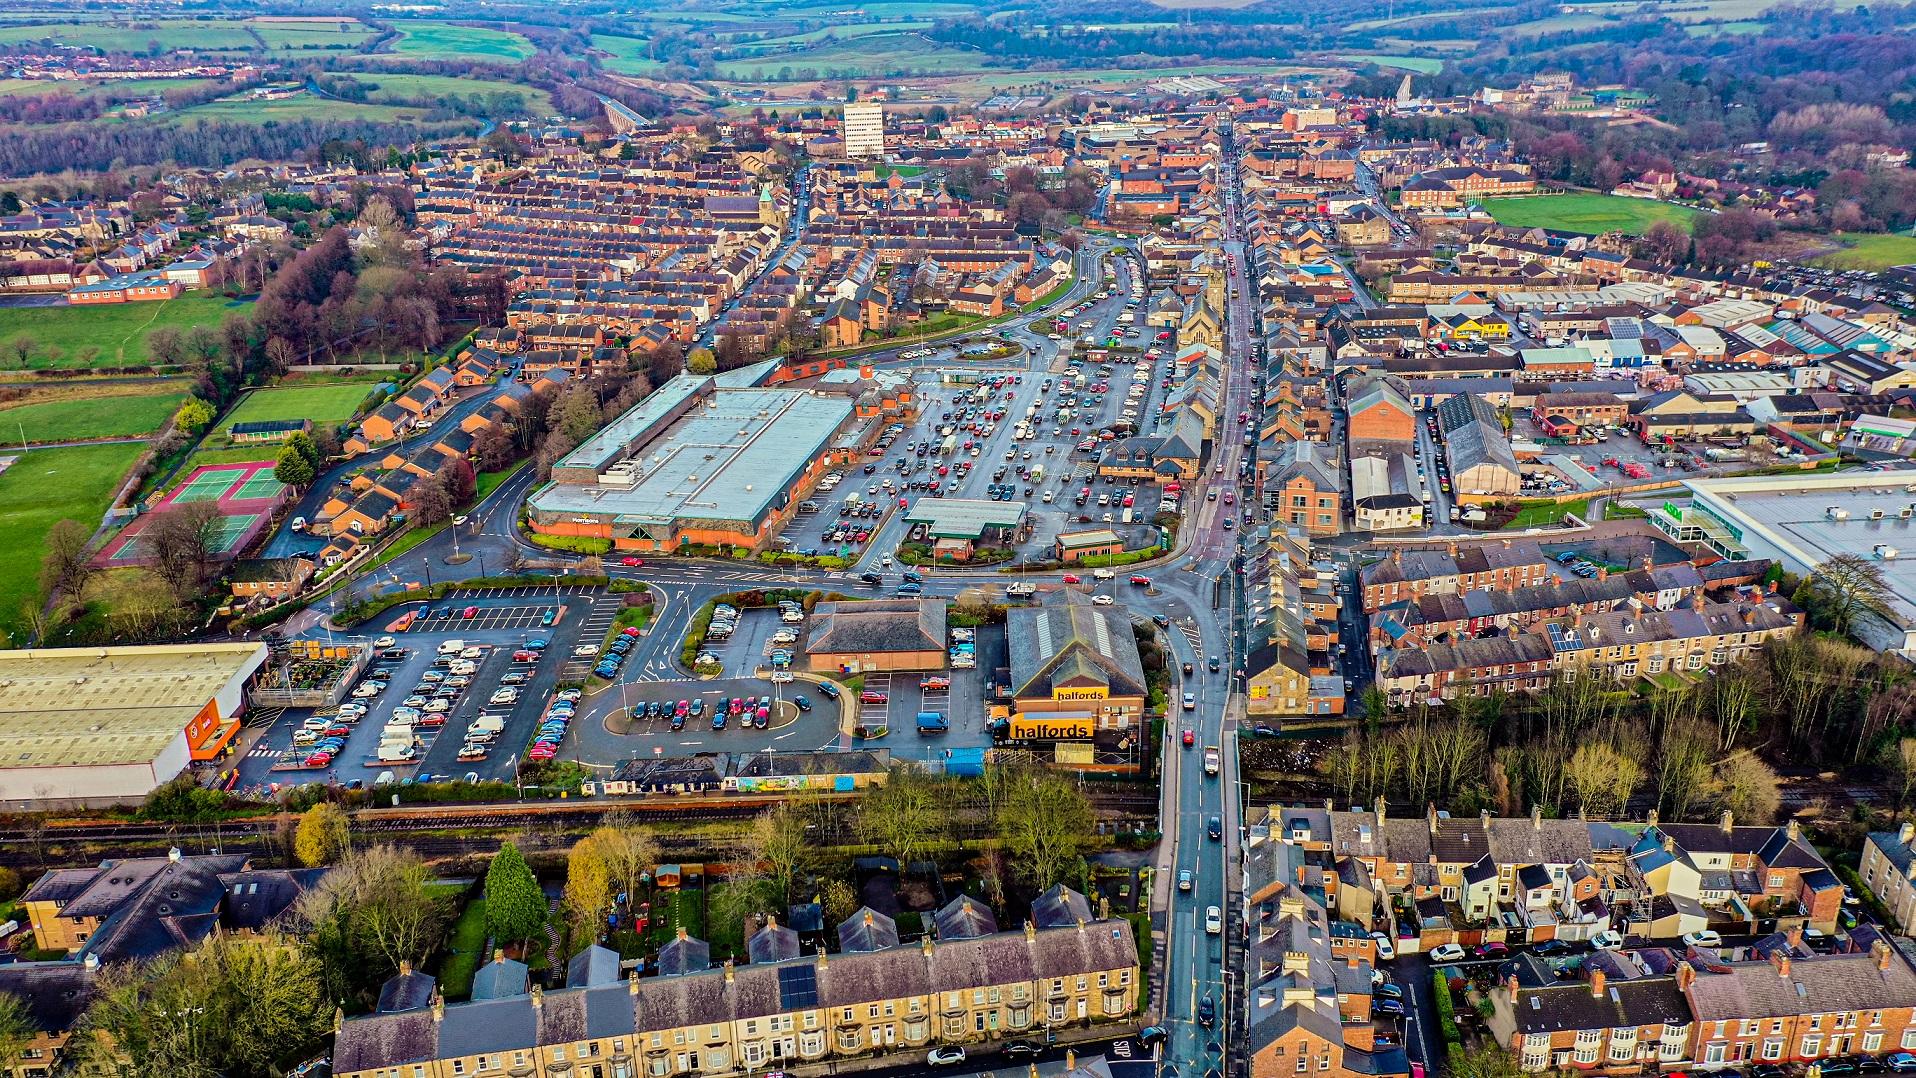 Council Bids For £46.8 Million Bid To Restore Historic Town